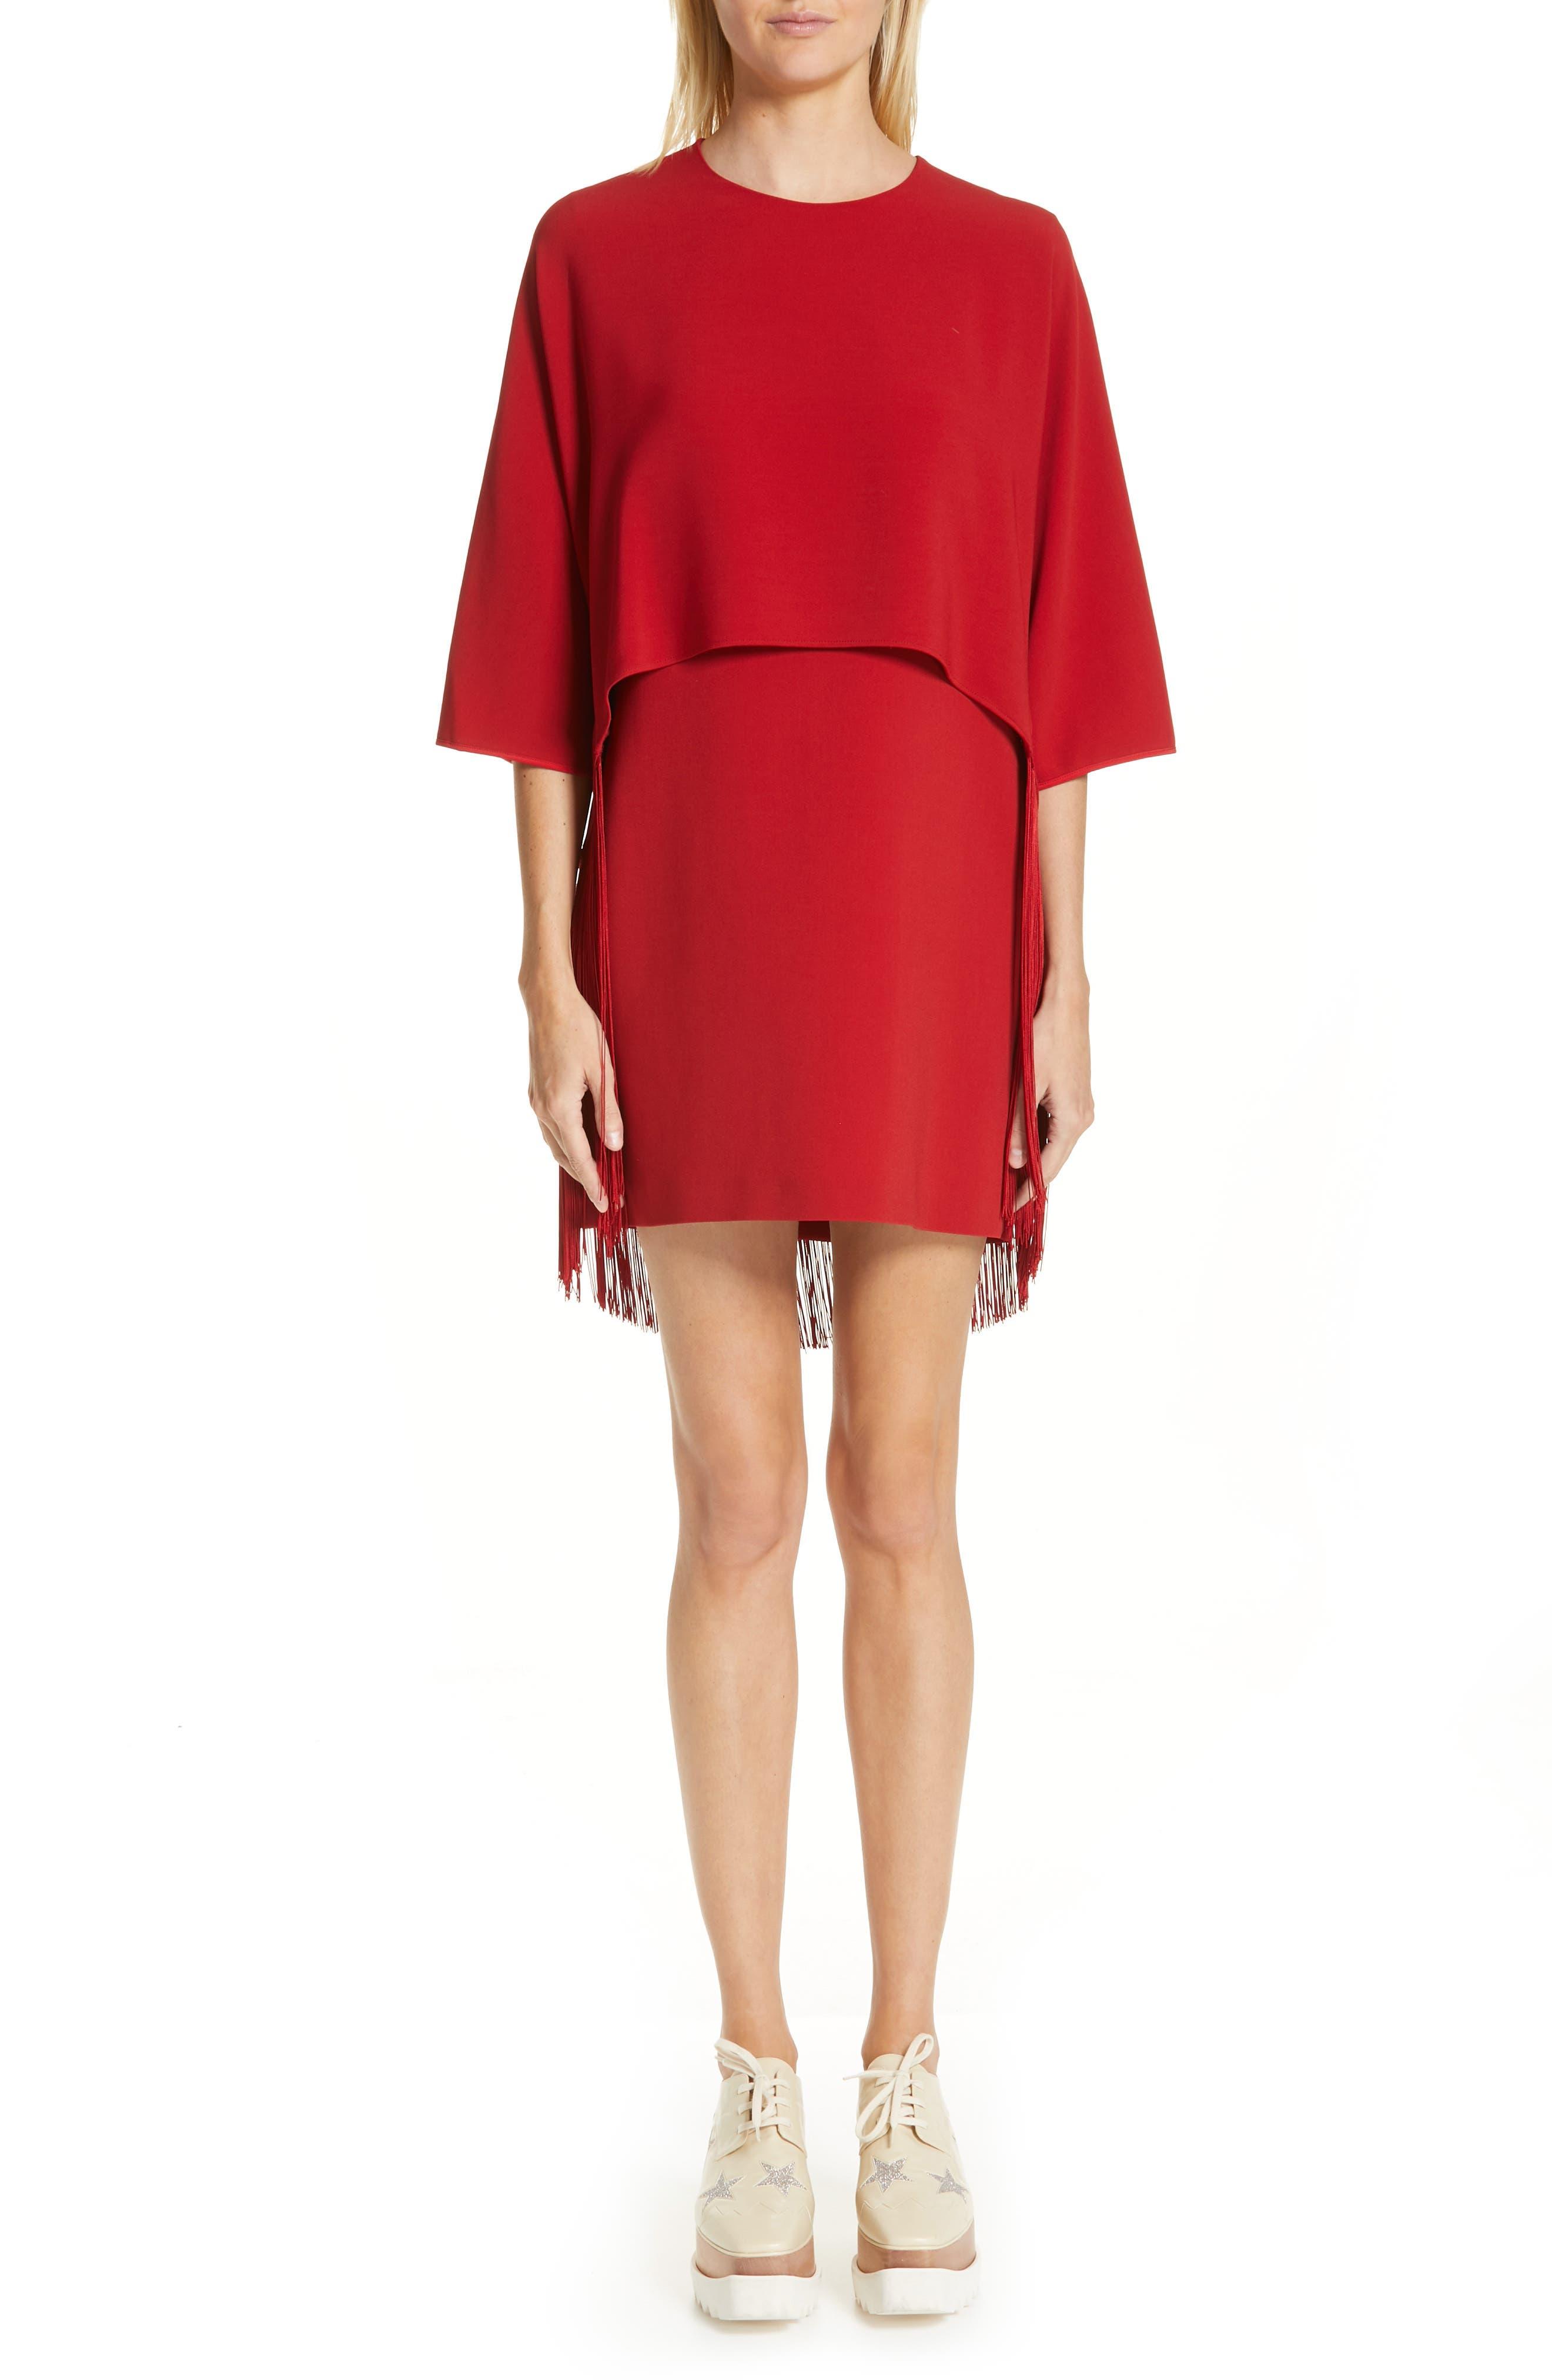 Stella Mccartney Fringe Overlay Stretch Cady Dress, US / 46 IT - Red